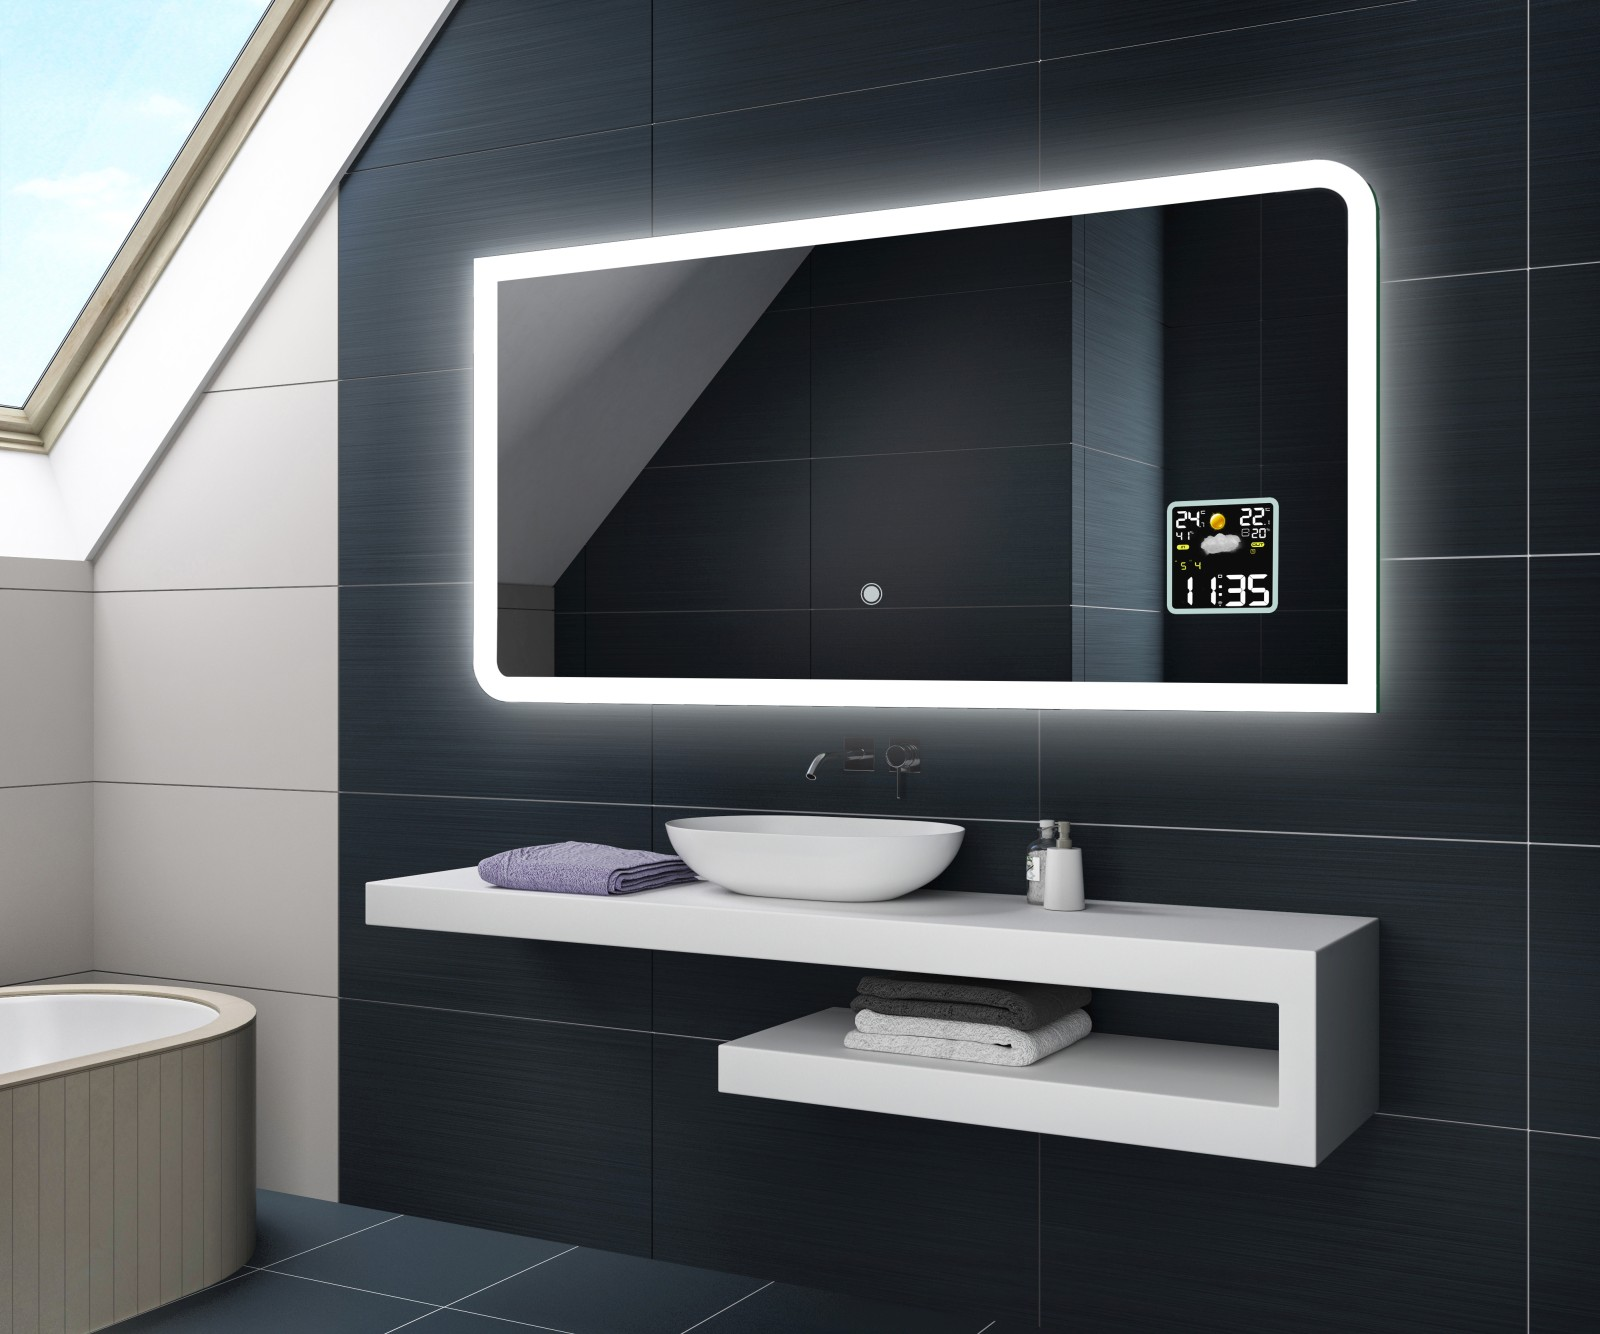 beau miroir salle de bain lumineux led station m t o. Black Bedroom Furniture Sets. Home Design Ideas